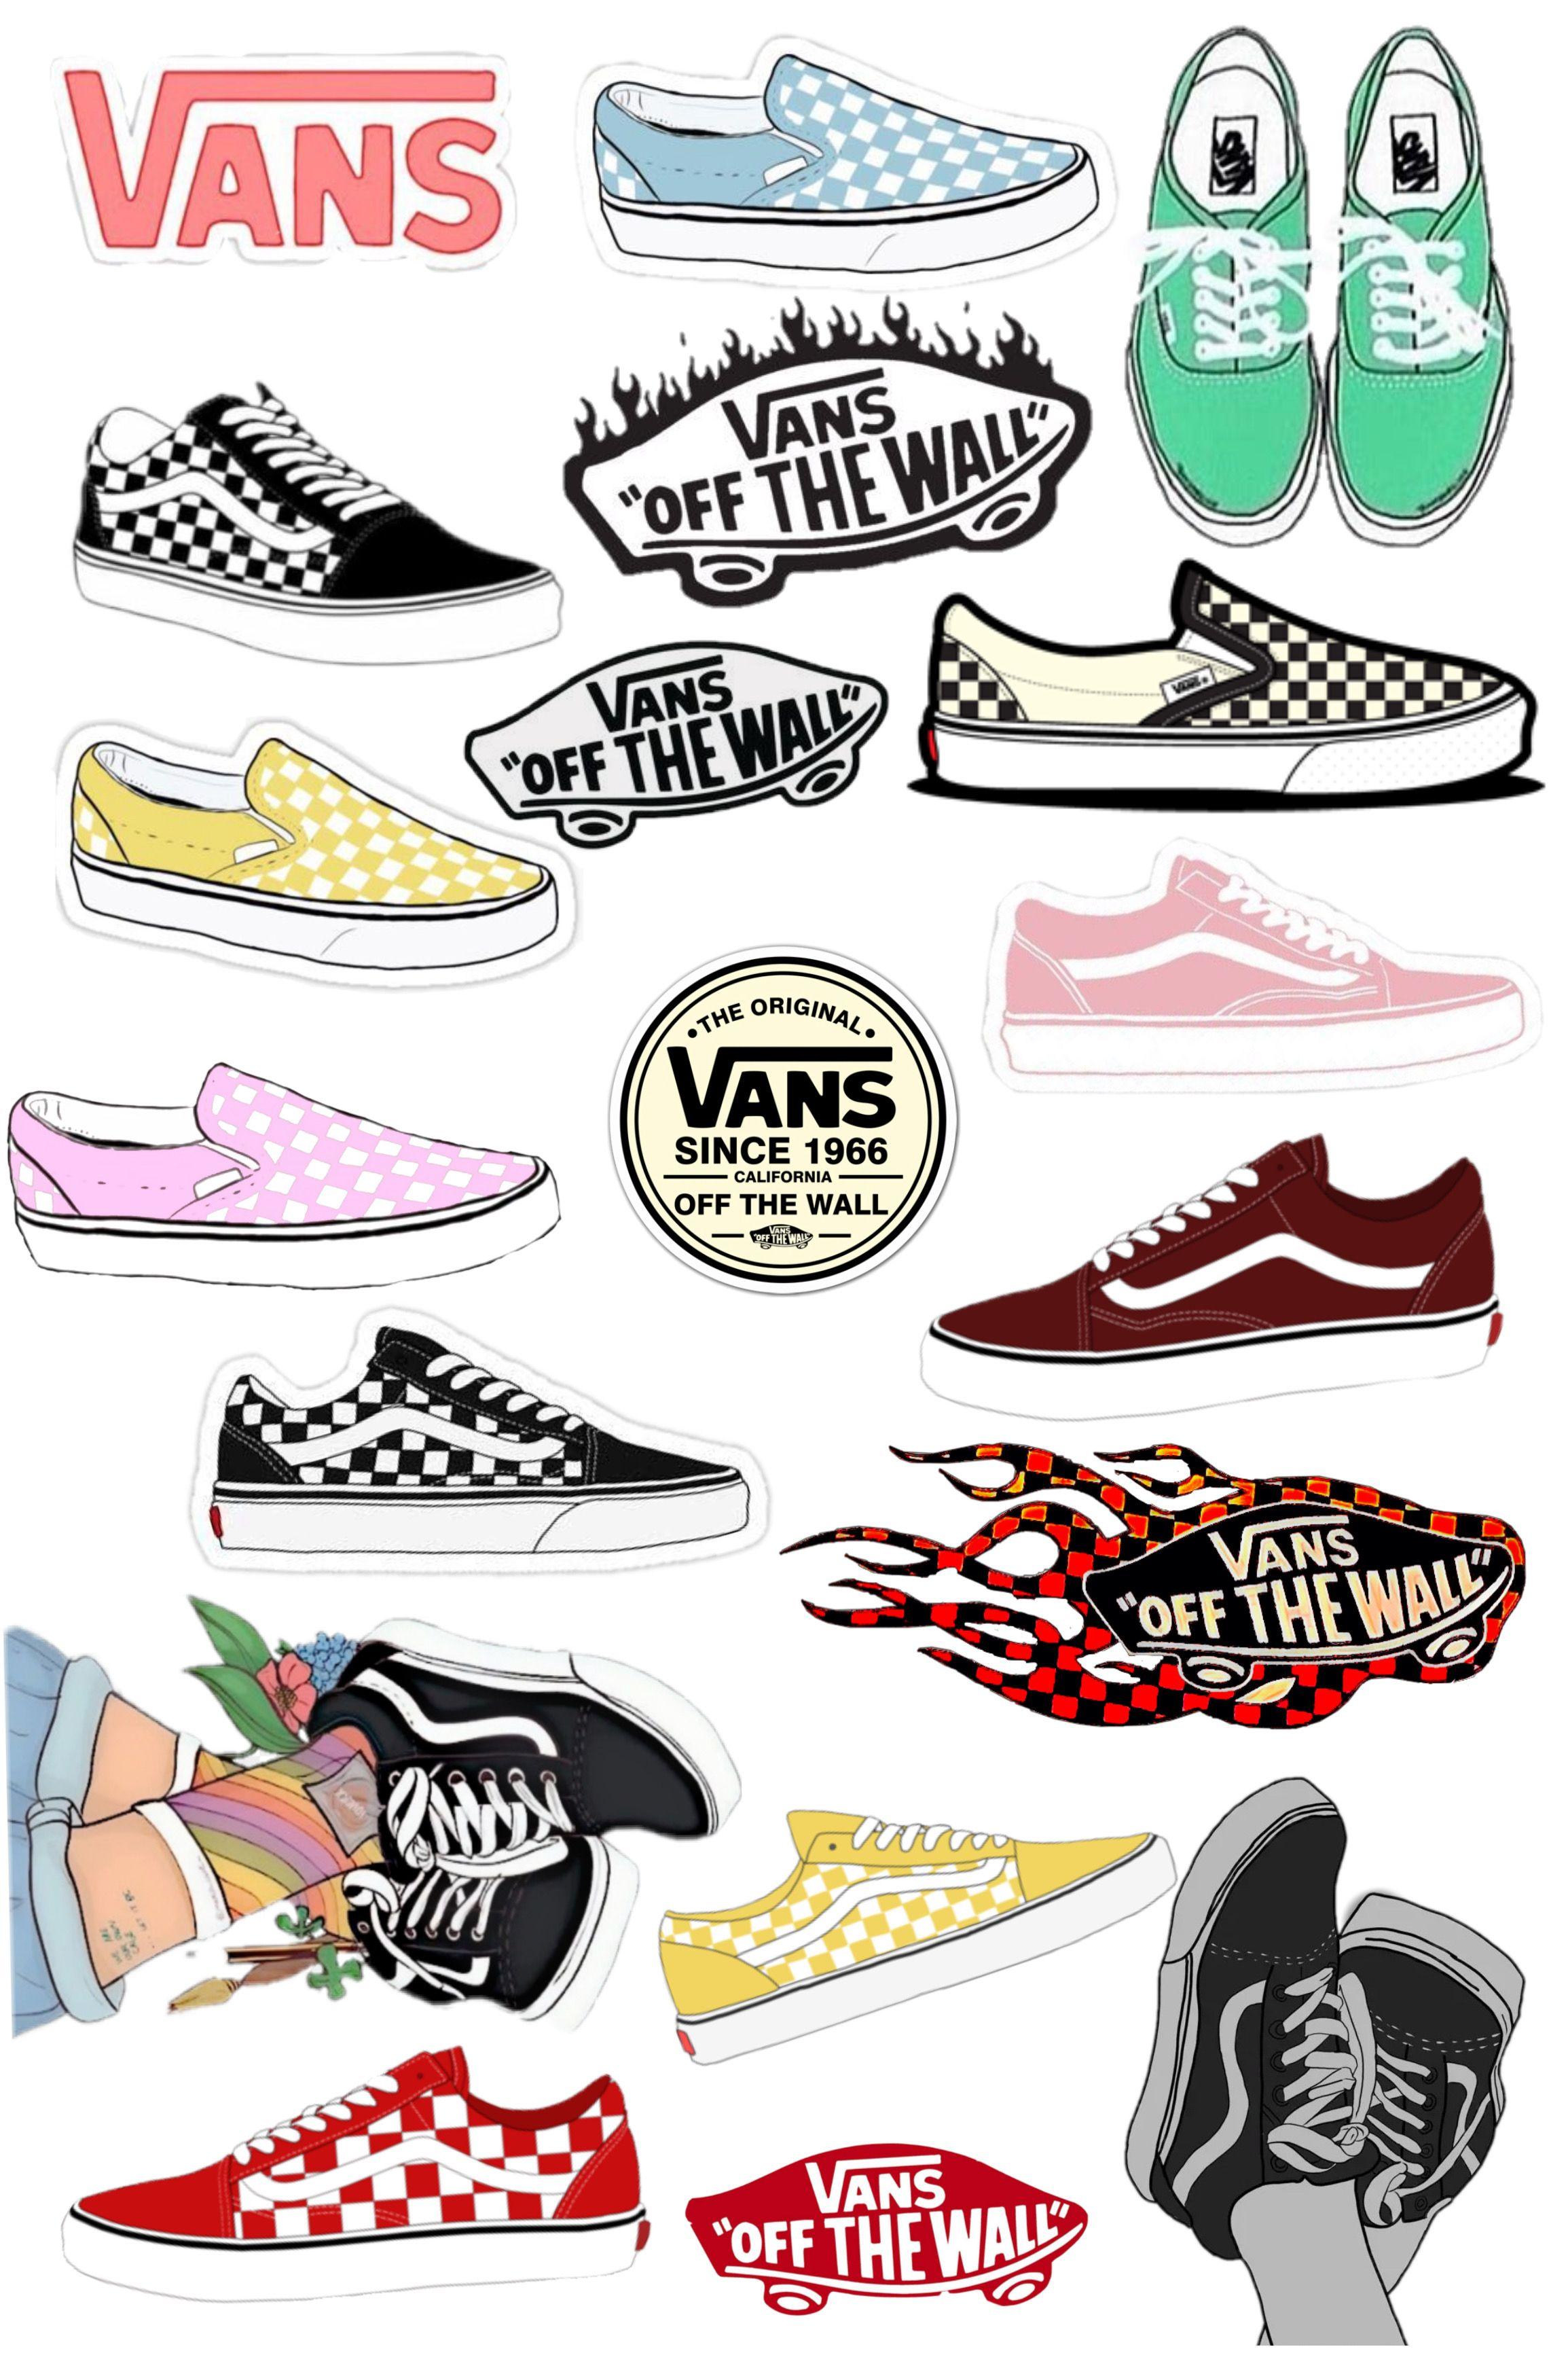 Stickers Vans | Vans stickers, Aesthetic stickers, Bubble stickers